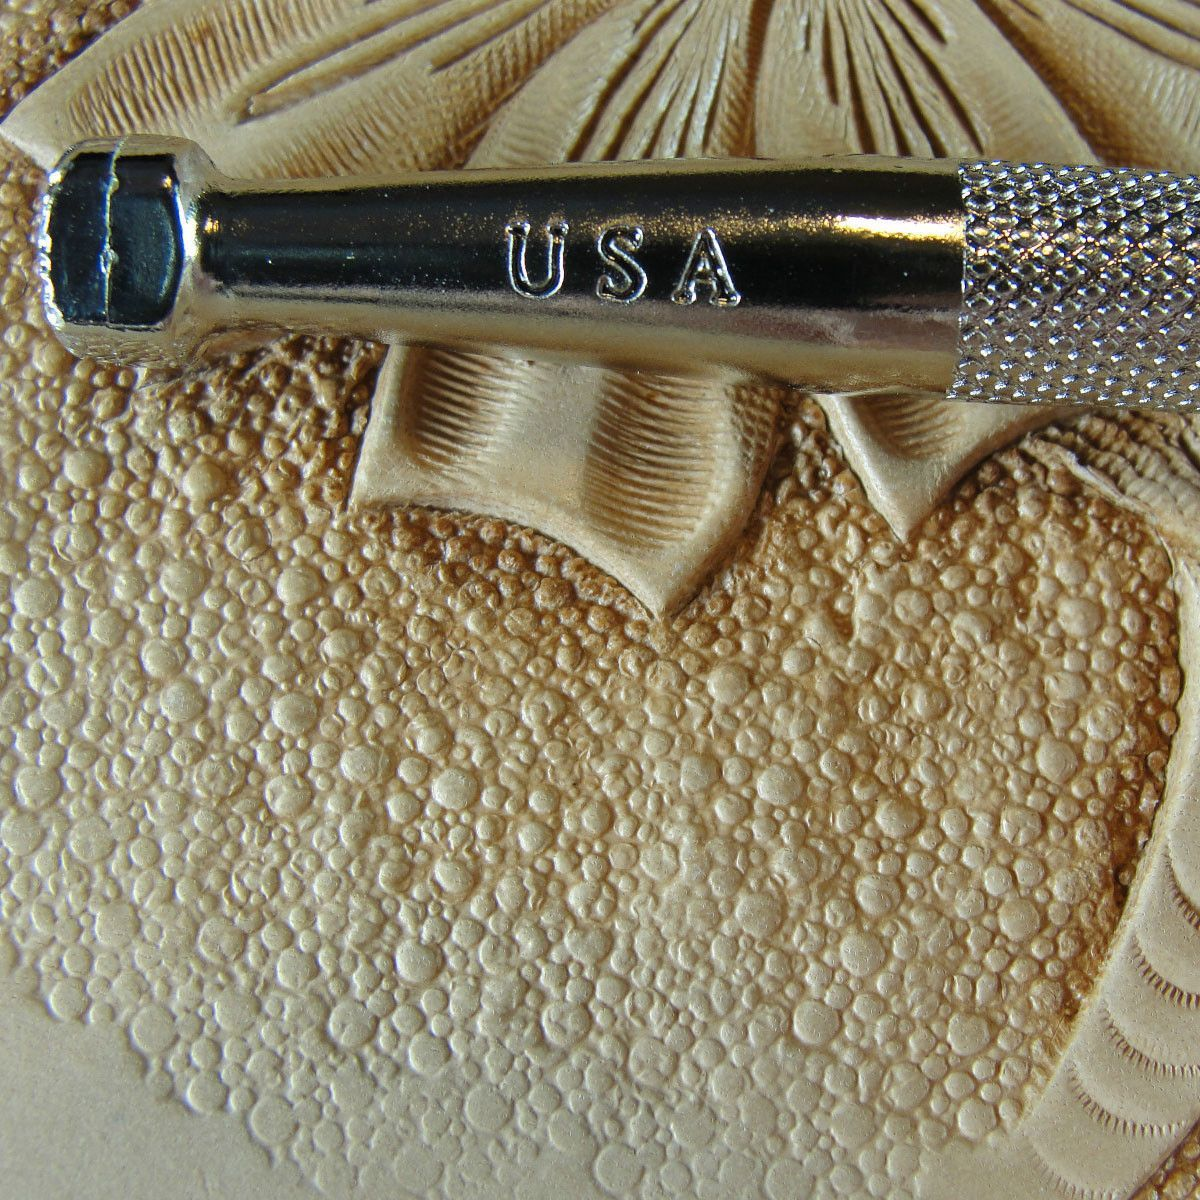 Medium Pebble Matting Texture Leather Working Tools Leather Craft Tools Leather Craft